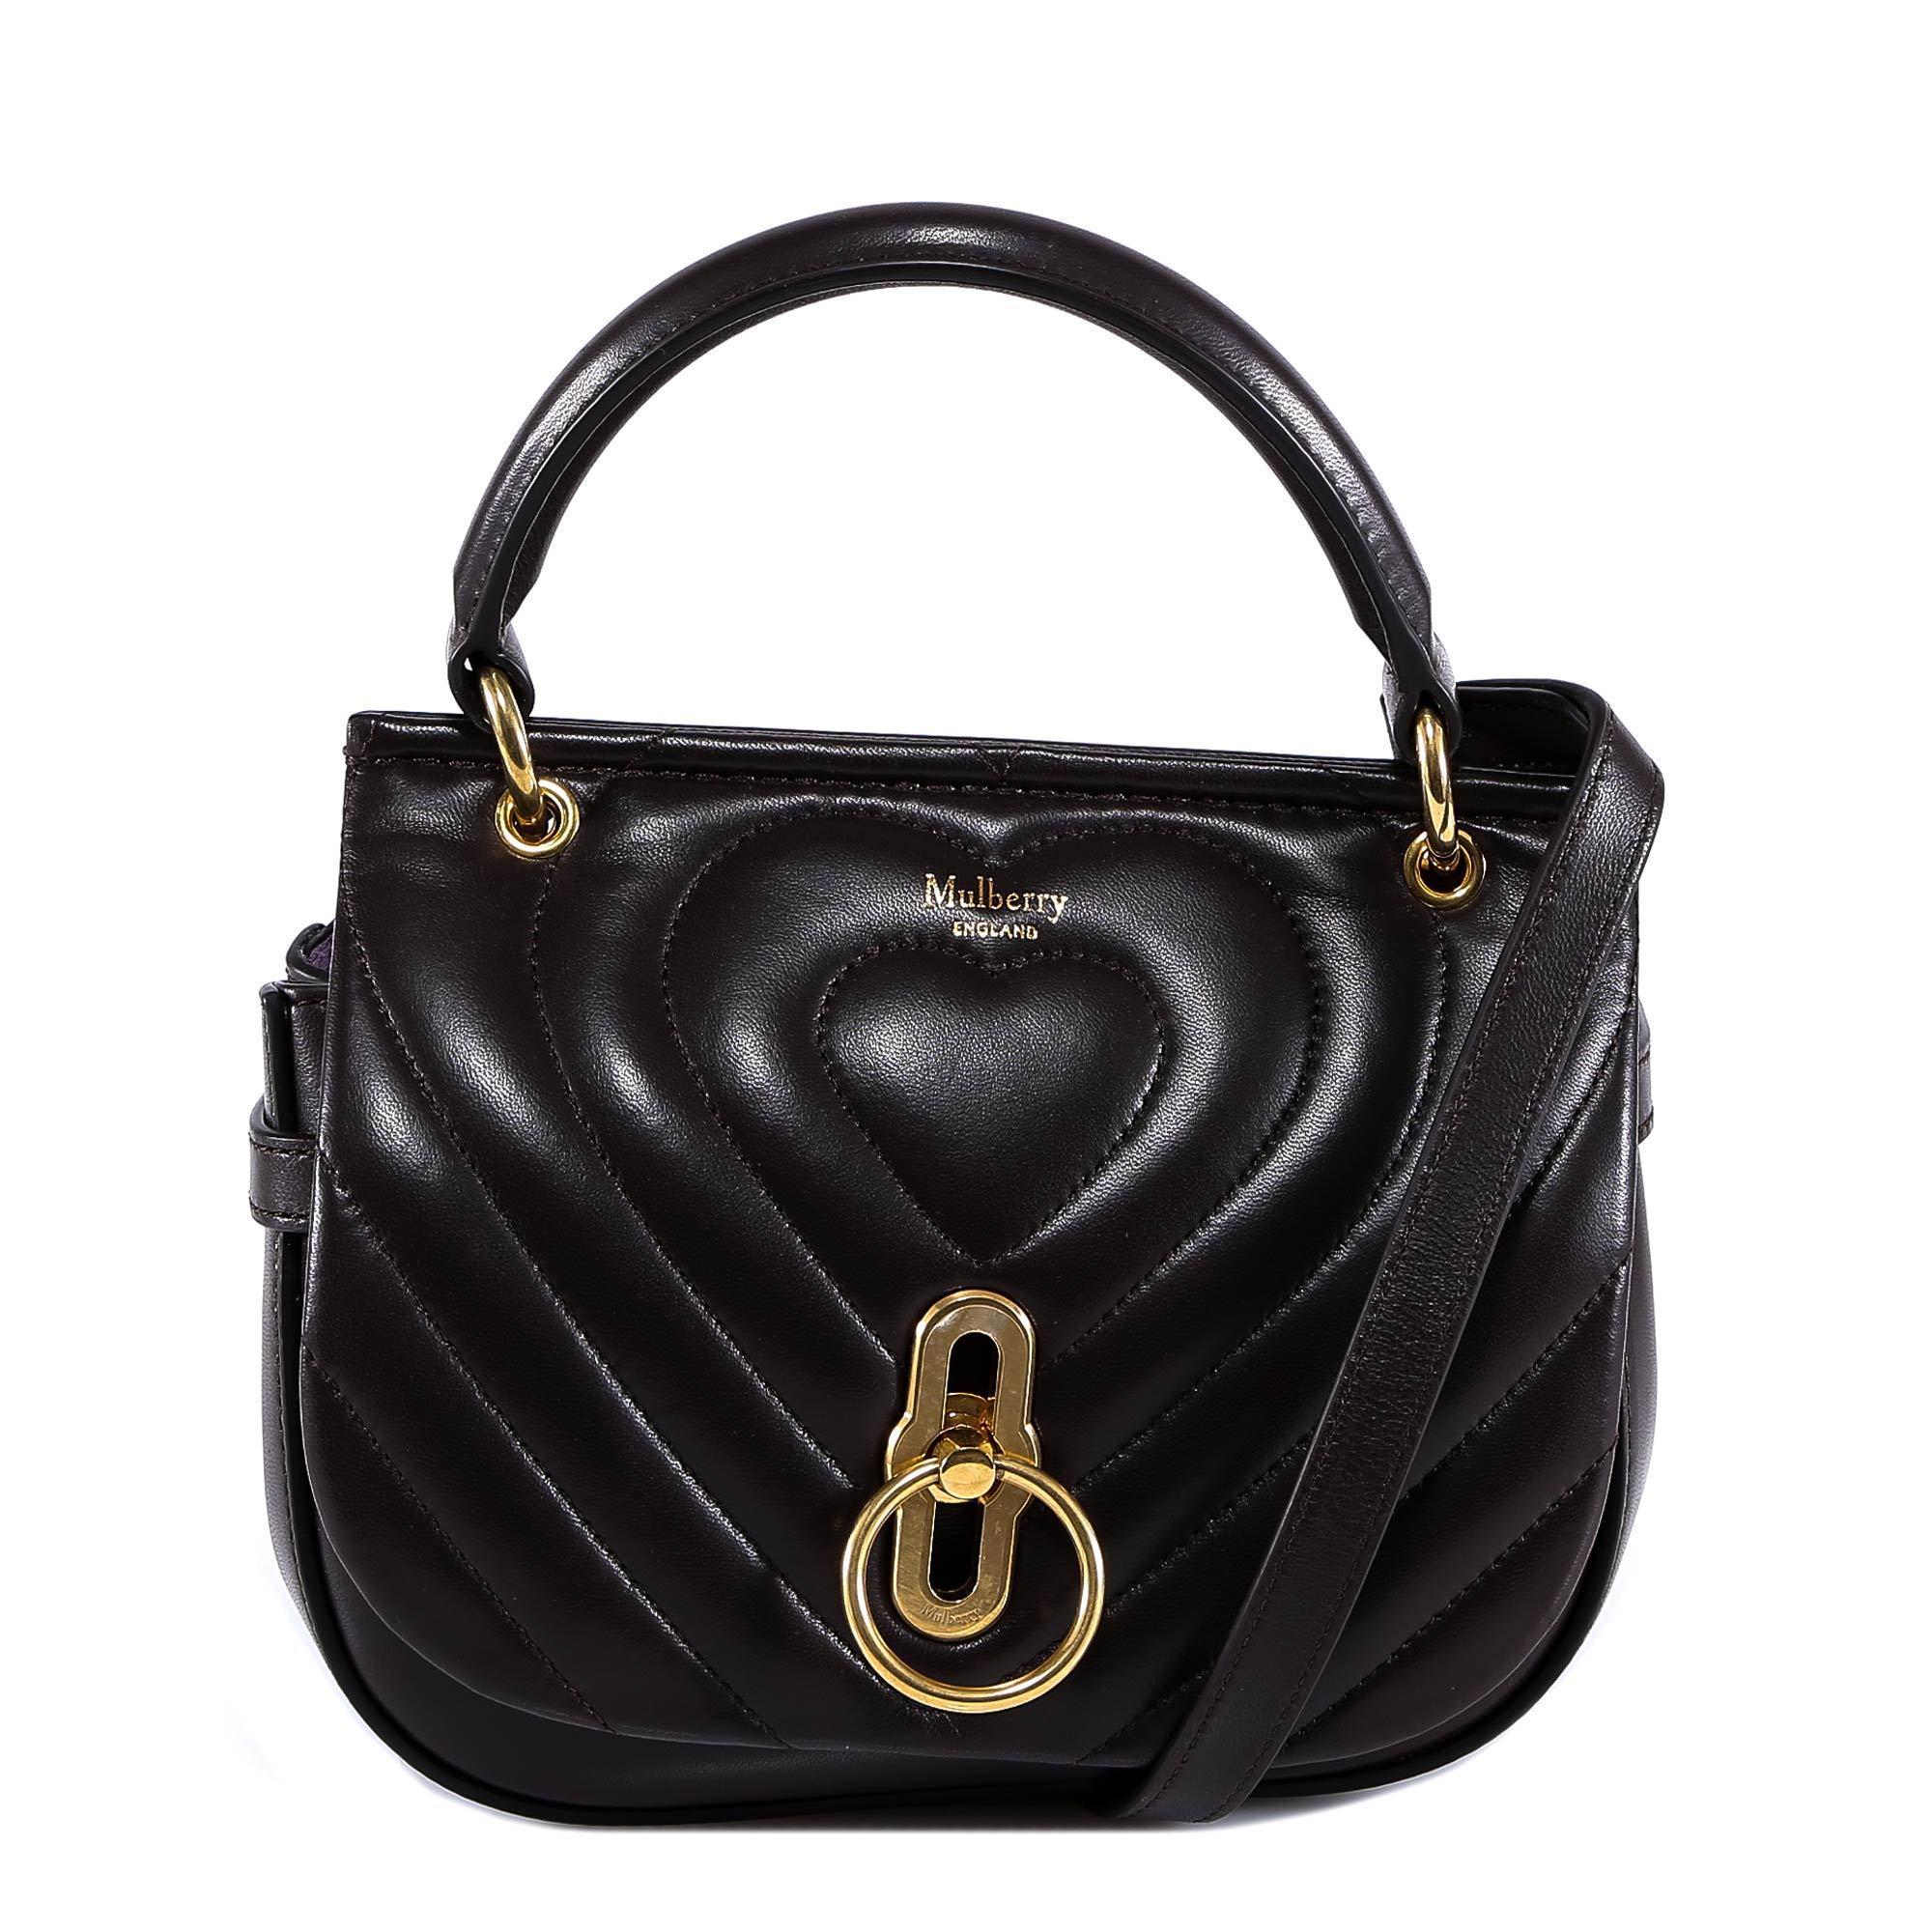 fd6a20942b Mulberry Amberley Crossbody Bag in Black - Save 24.56140350877193 ...